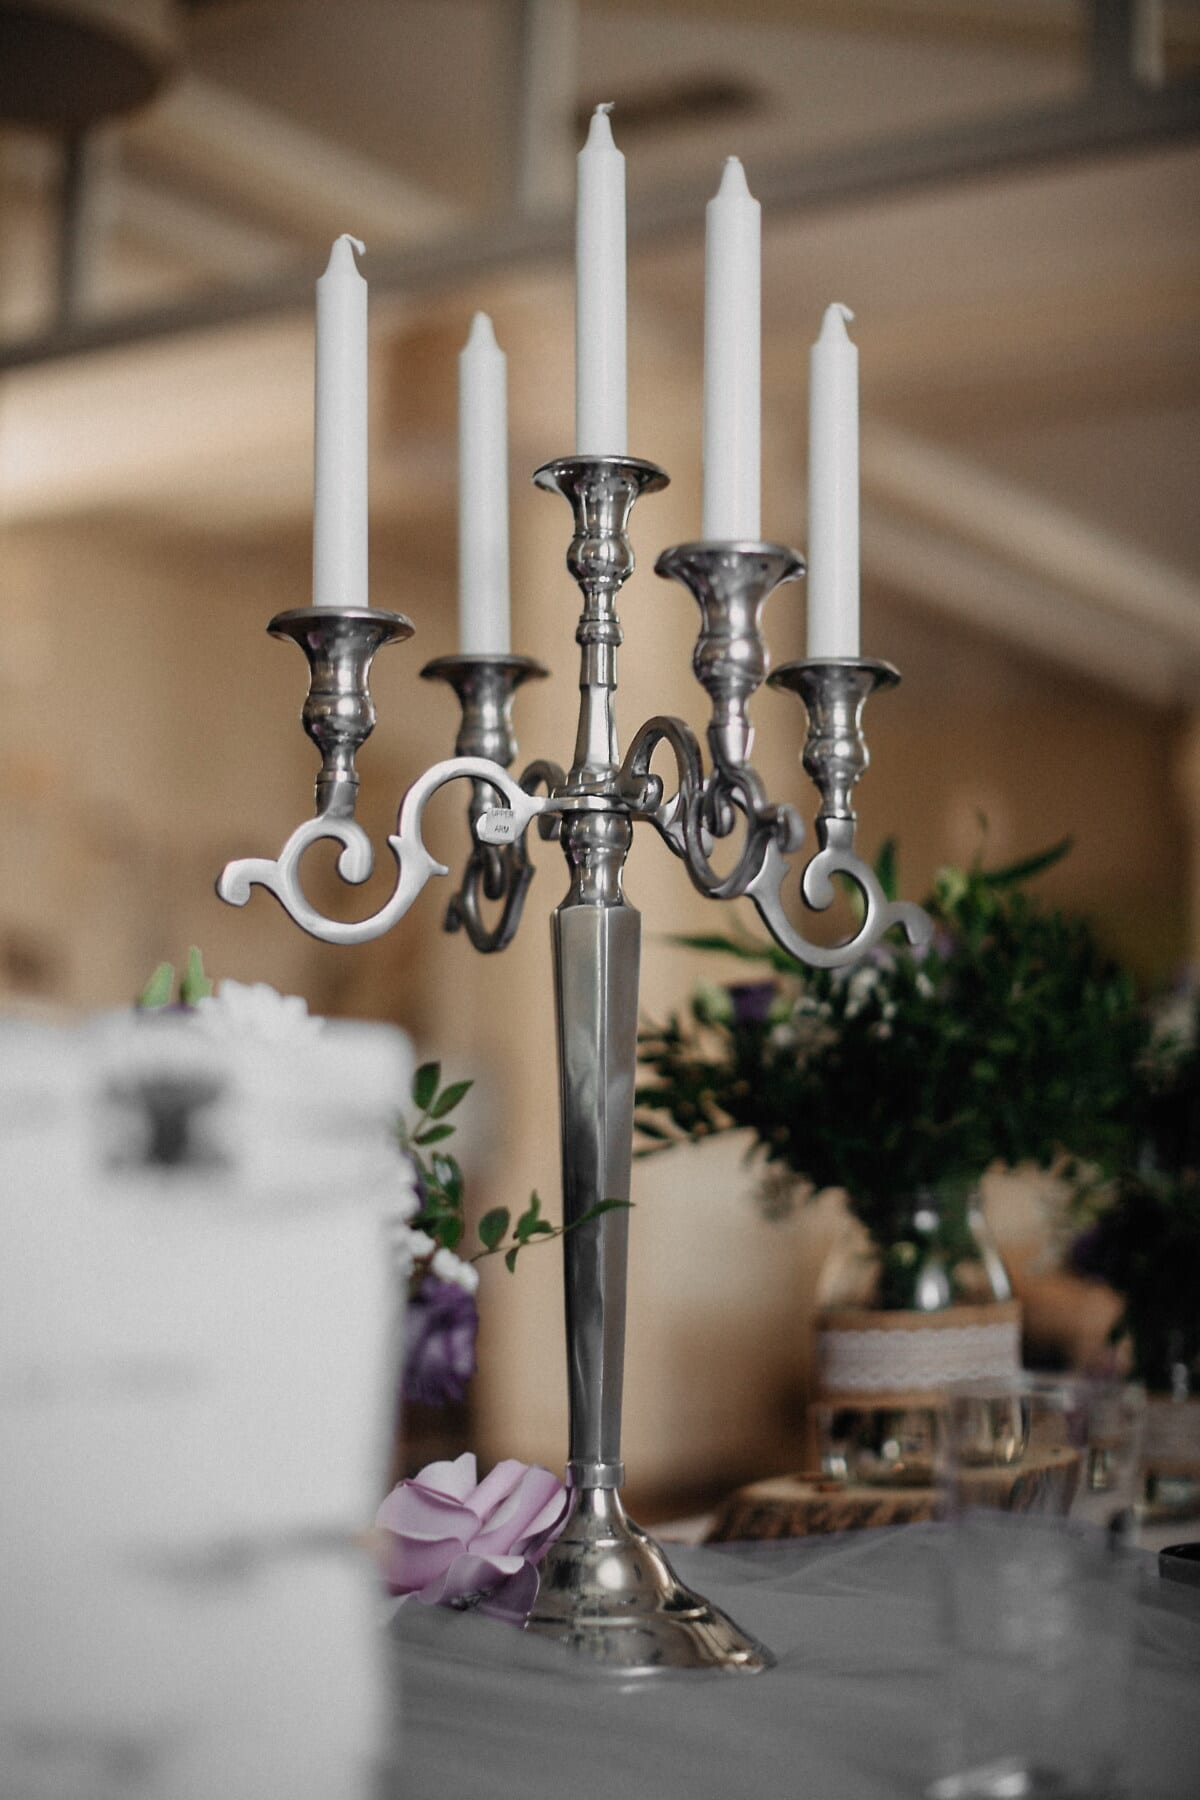 baroque, silver, candlestick, white, candles, elegant, holder, candle, indoors, interior design